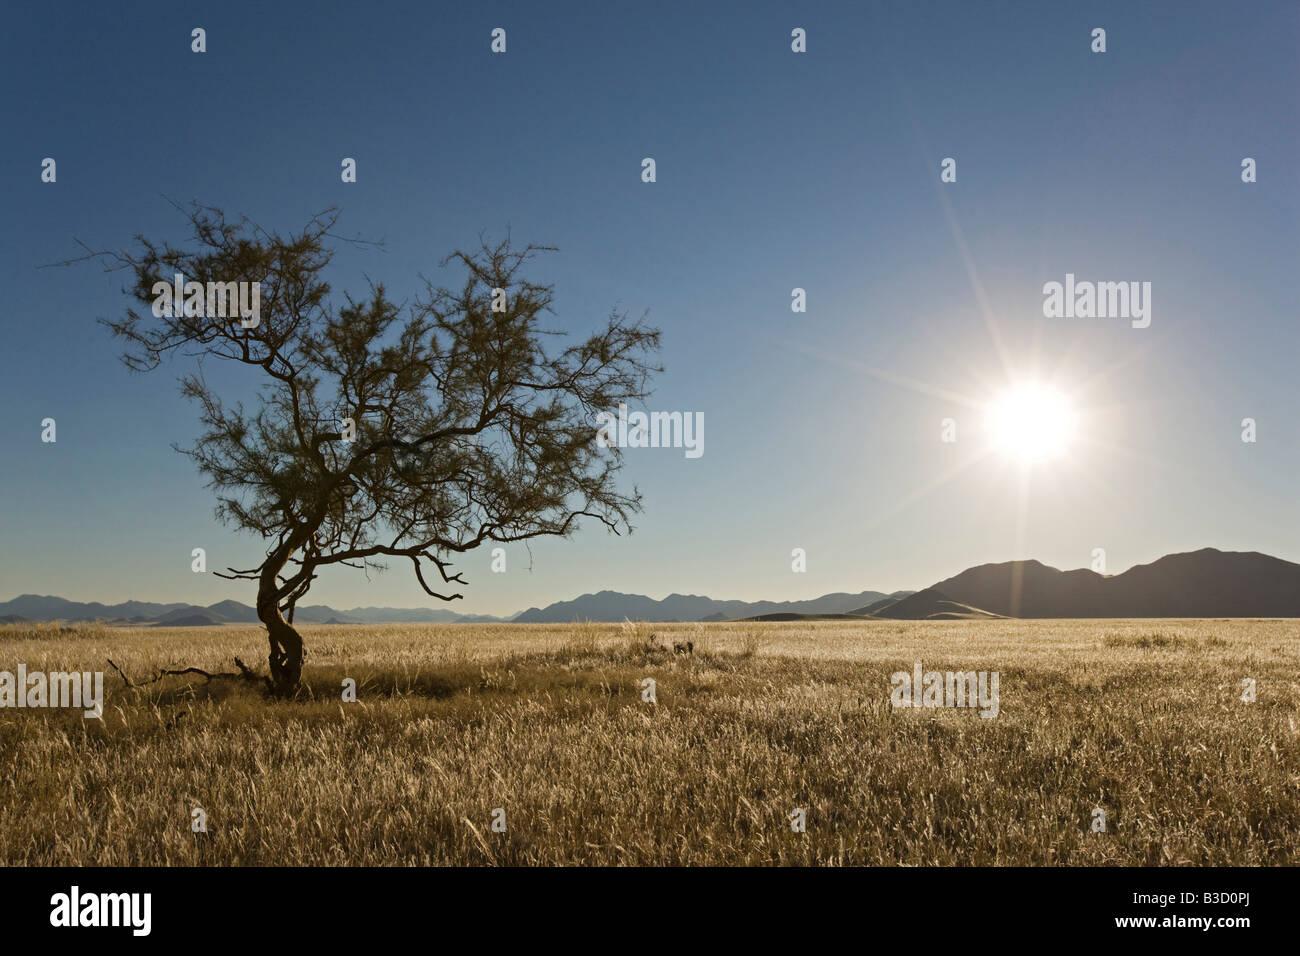 Africa, Namibia, Grass land - Stock Image